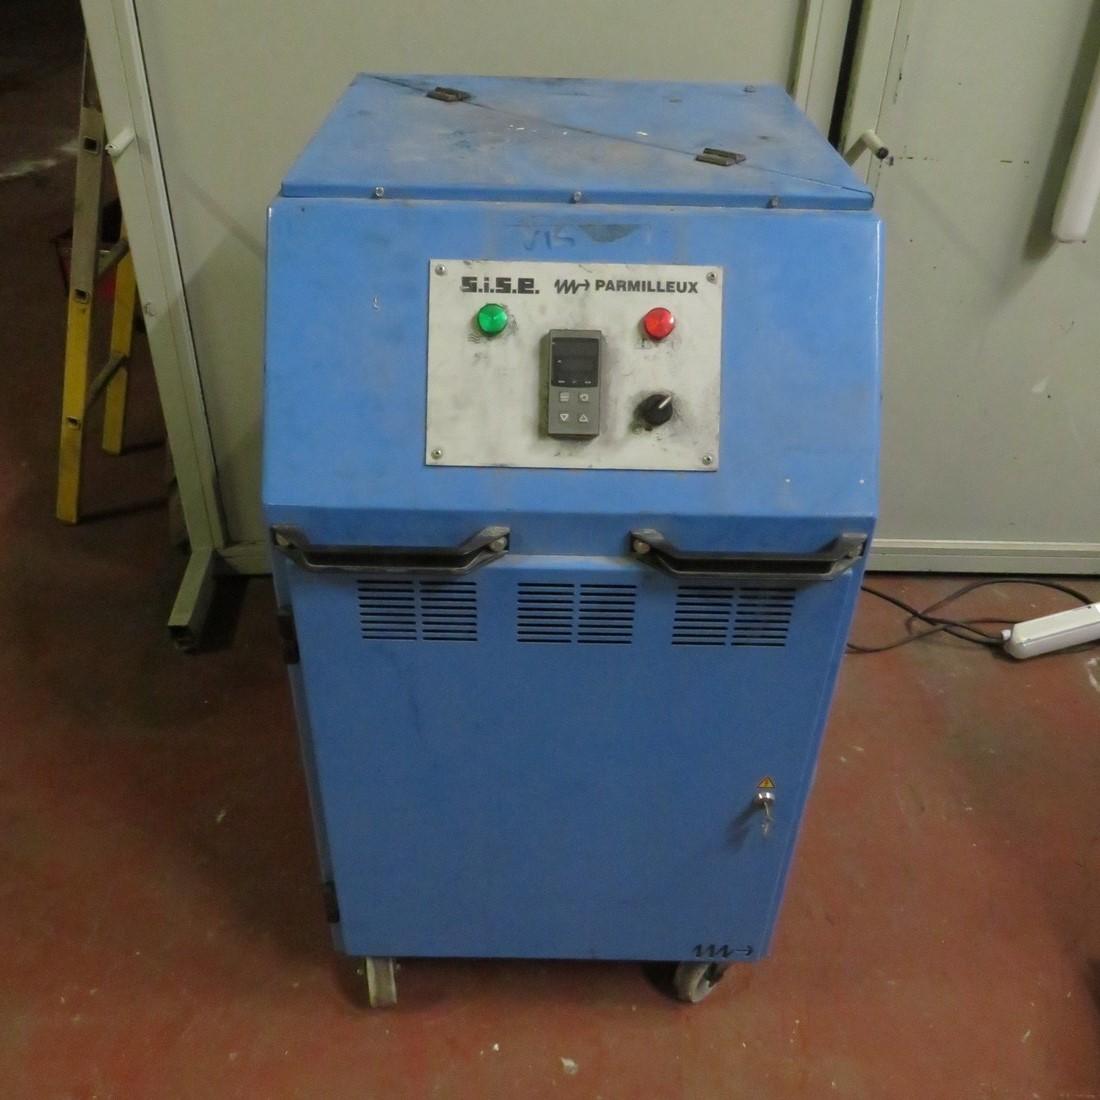 SISE PARMILLEUX boiler XHV2 10E13 type